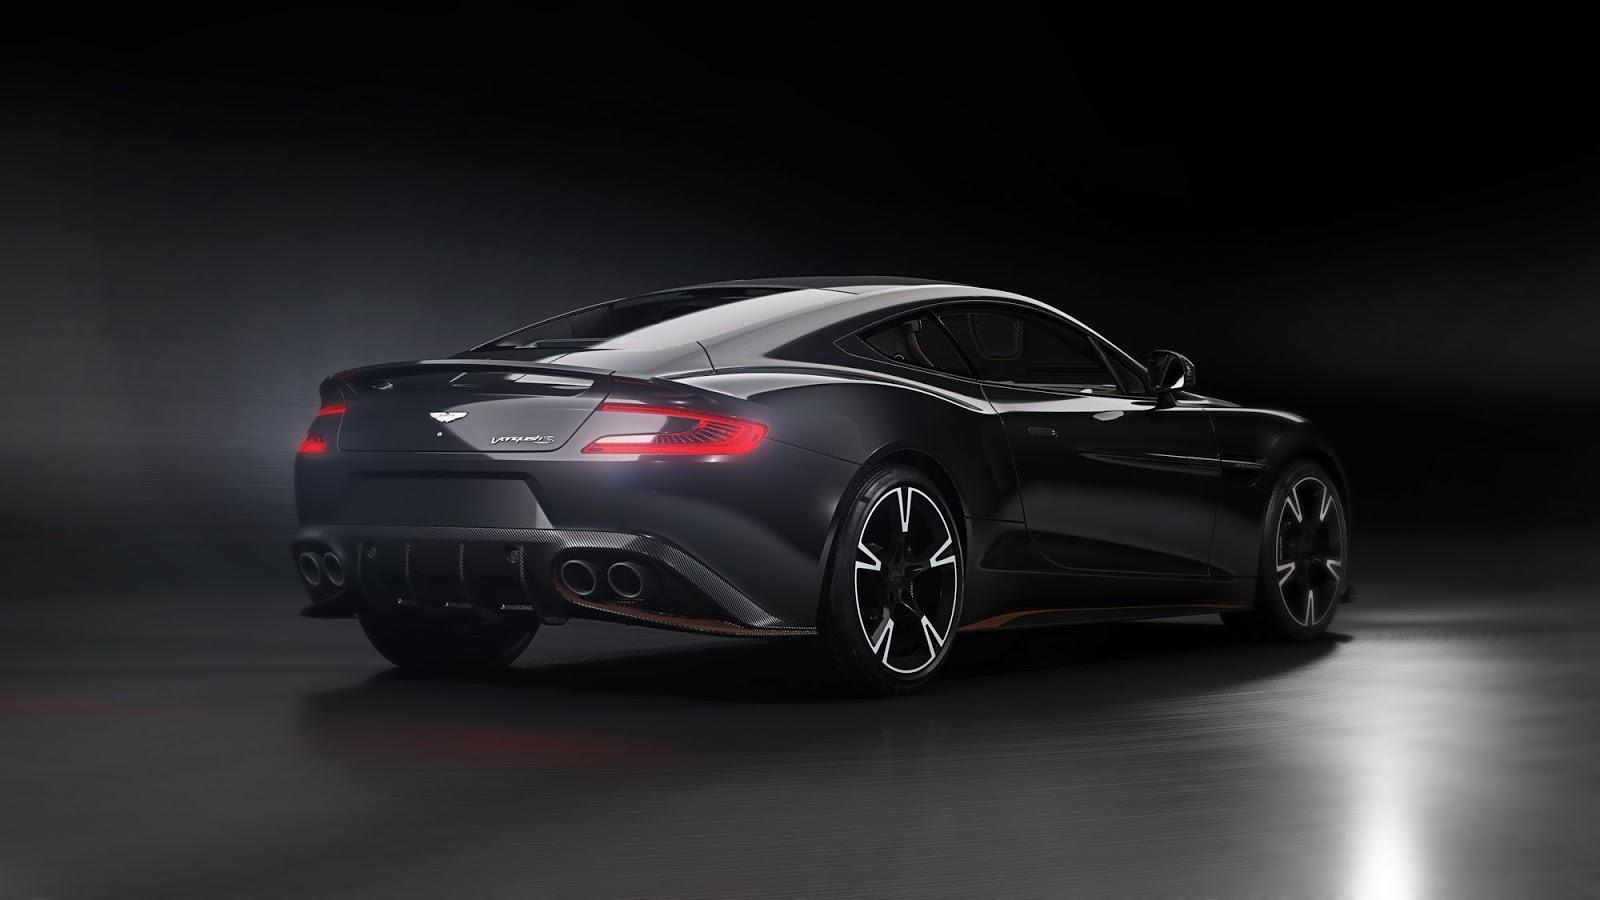 Aston-Martin-Vanquish-S-Ultimate-2